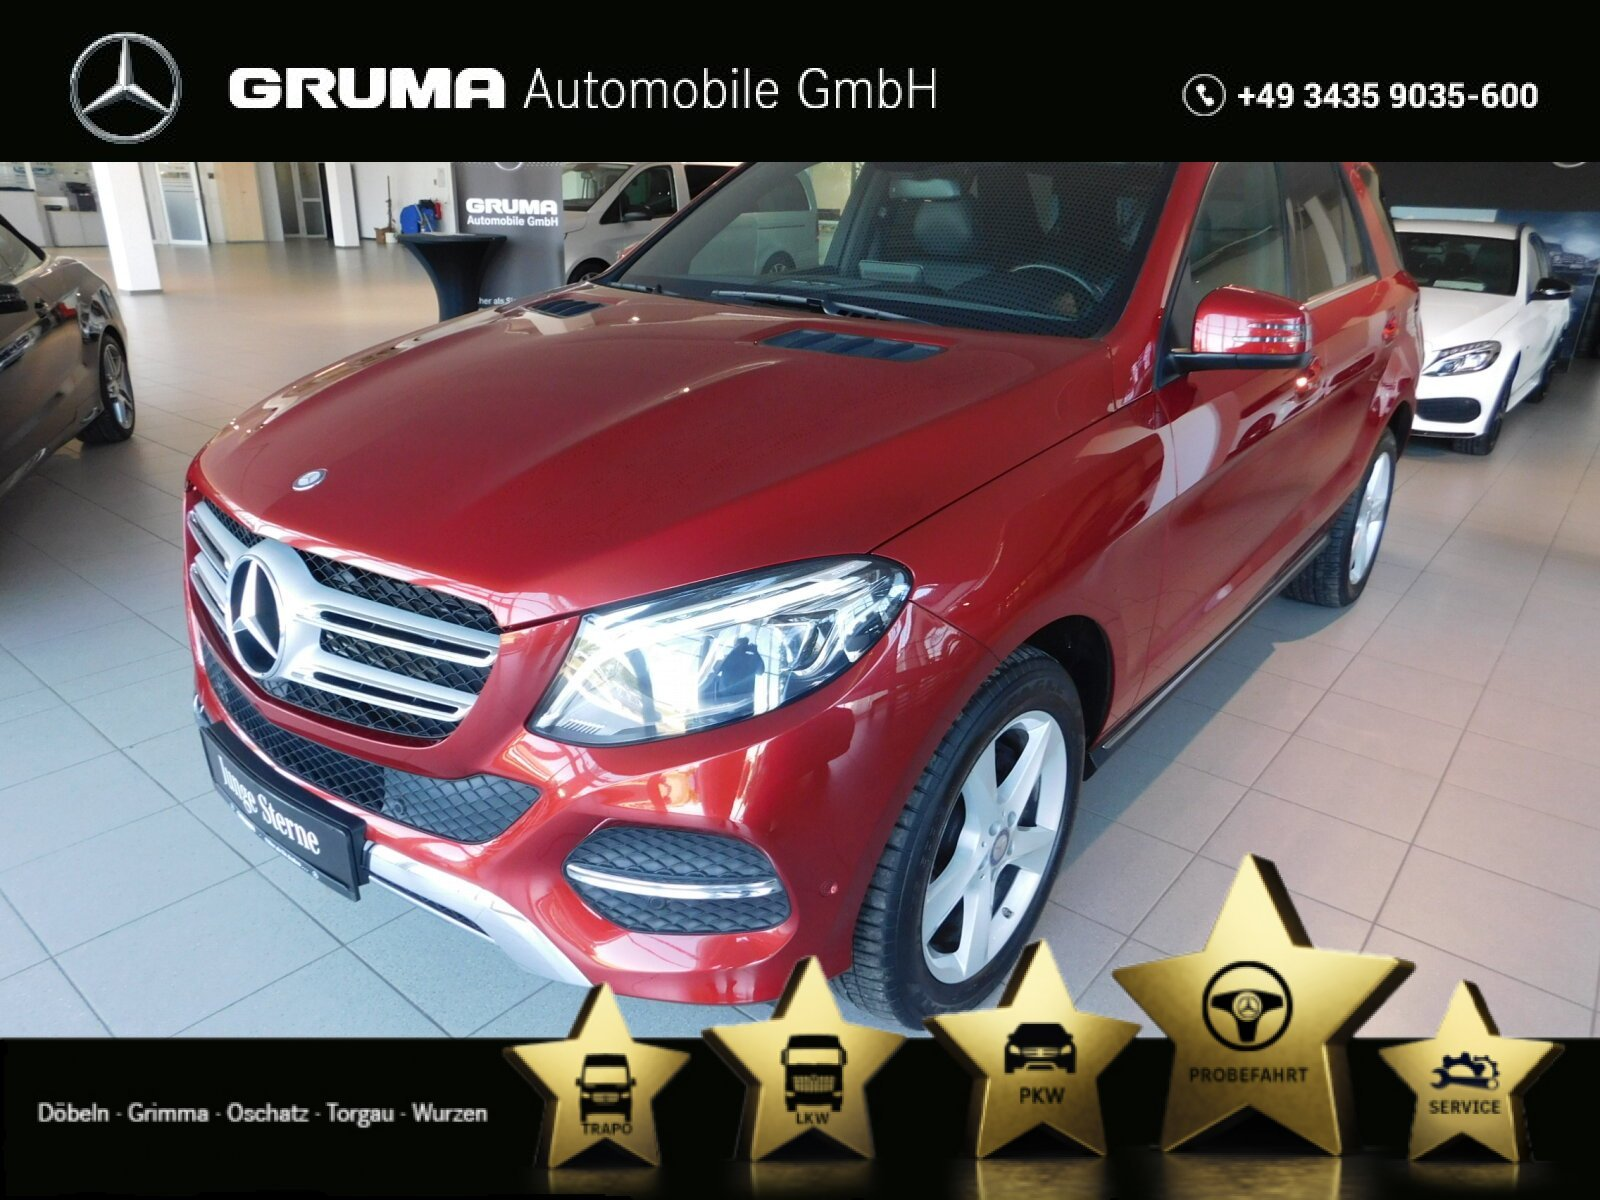 Mercedes-Benz GLE 250 d 4M 9G NAVI+EASYPACK+LED+4xSITZHEIZUNG, Jahr 2016, Diesel